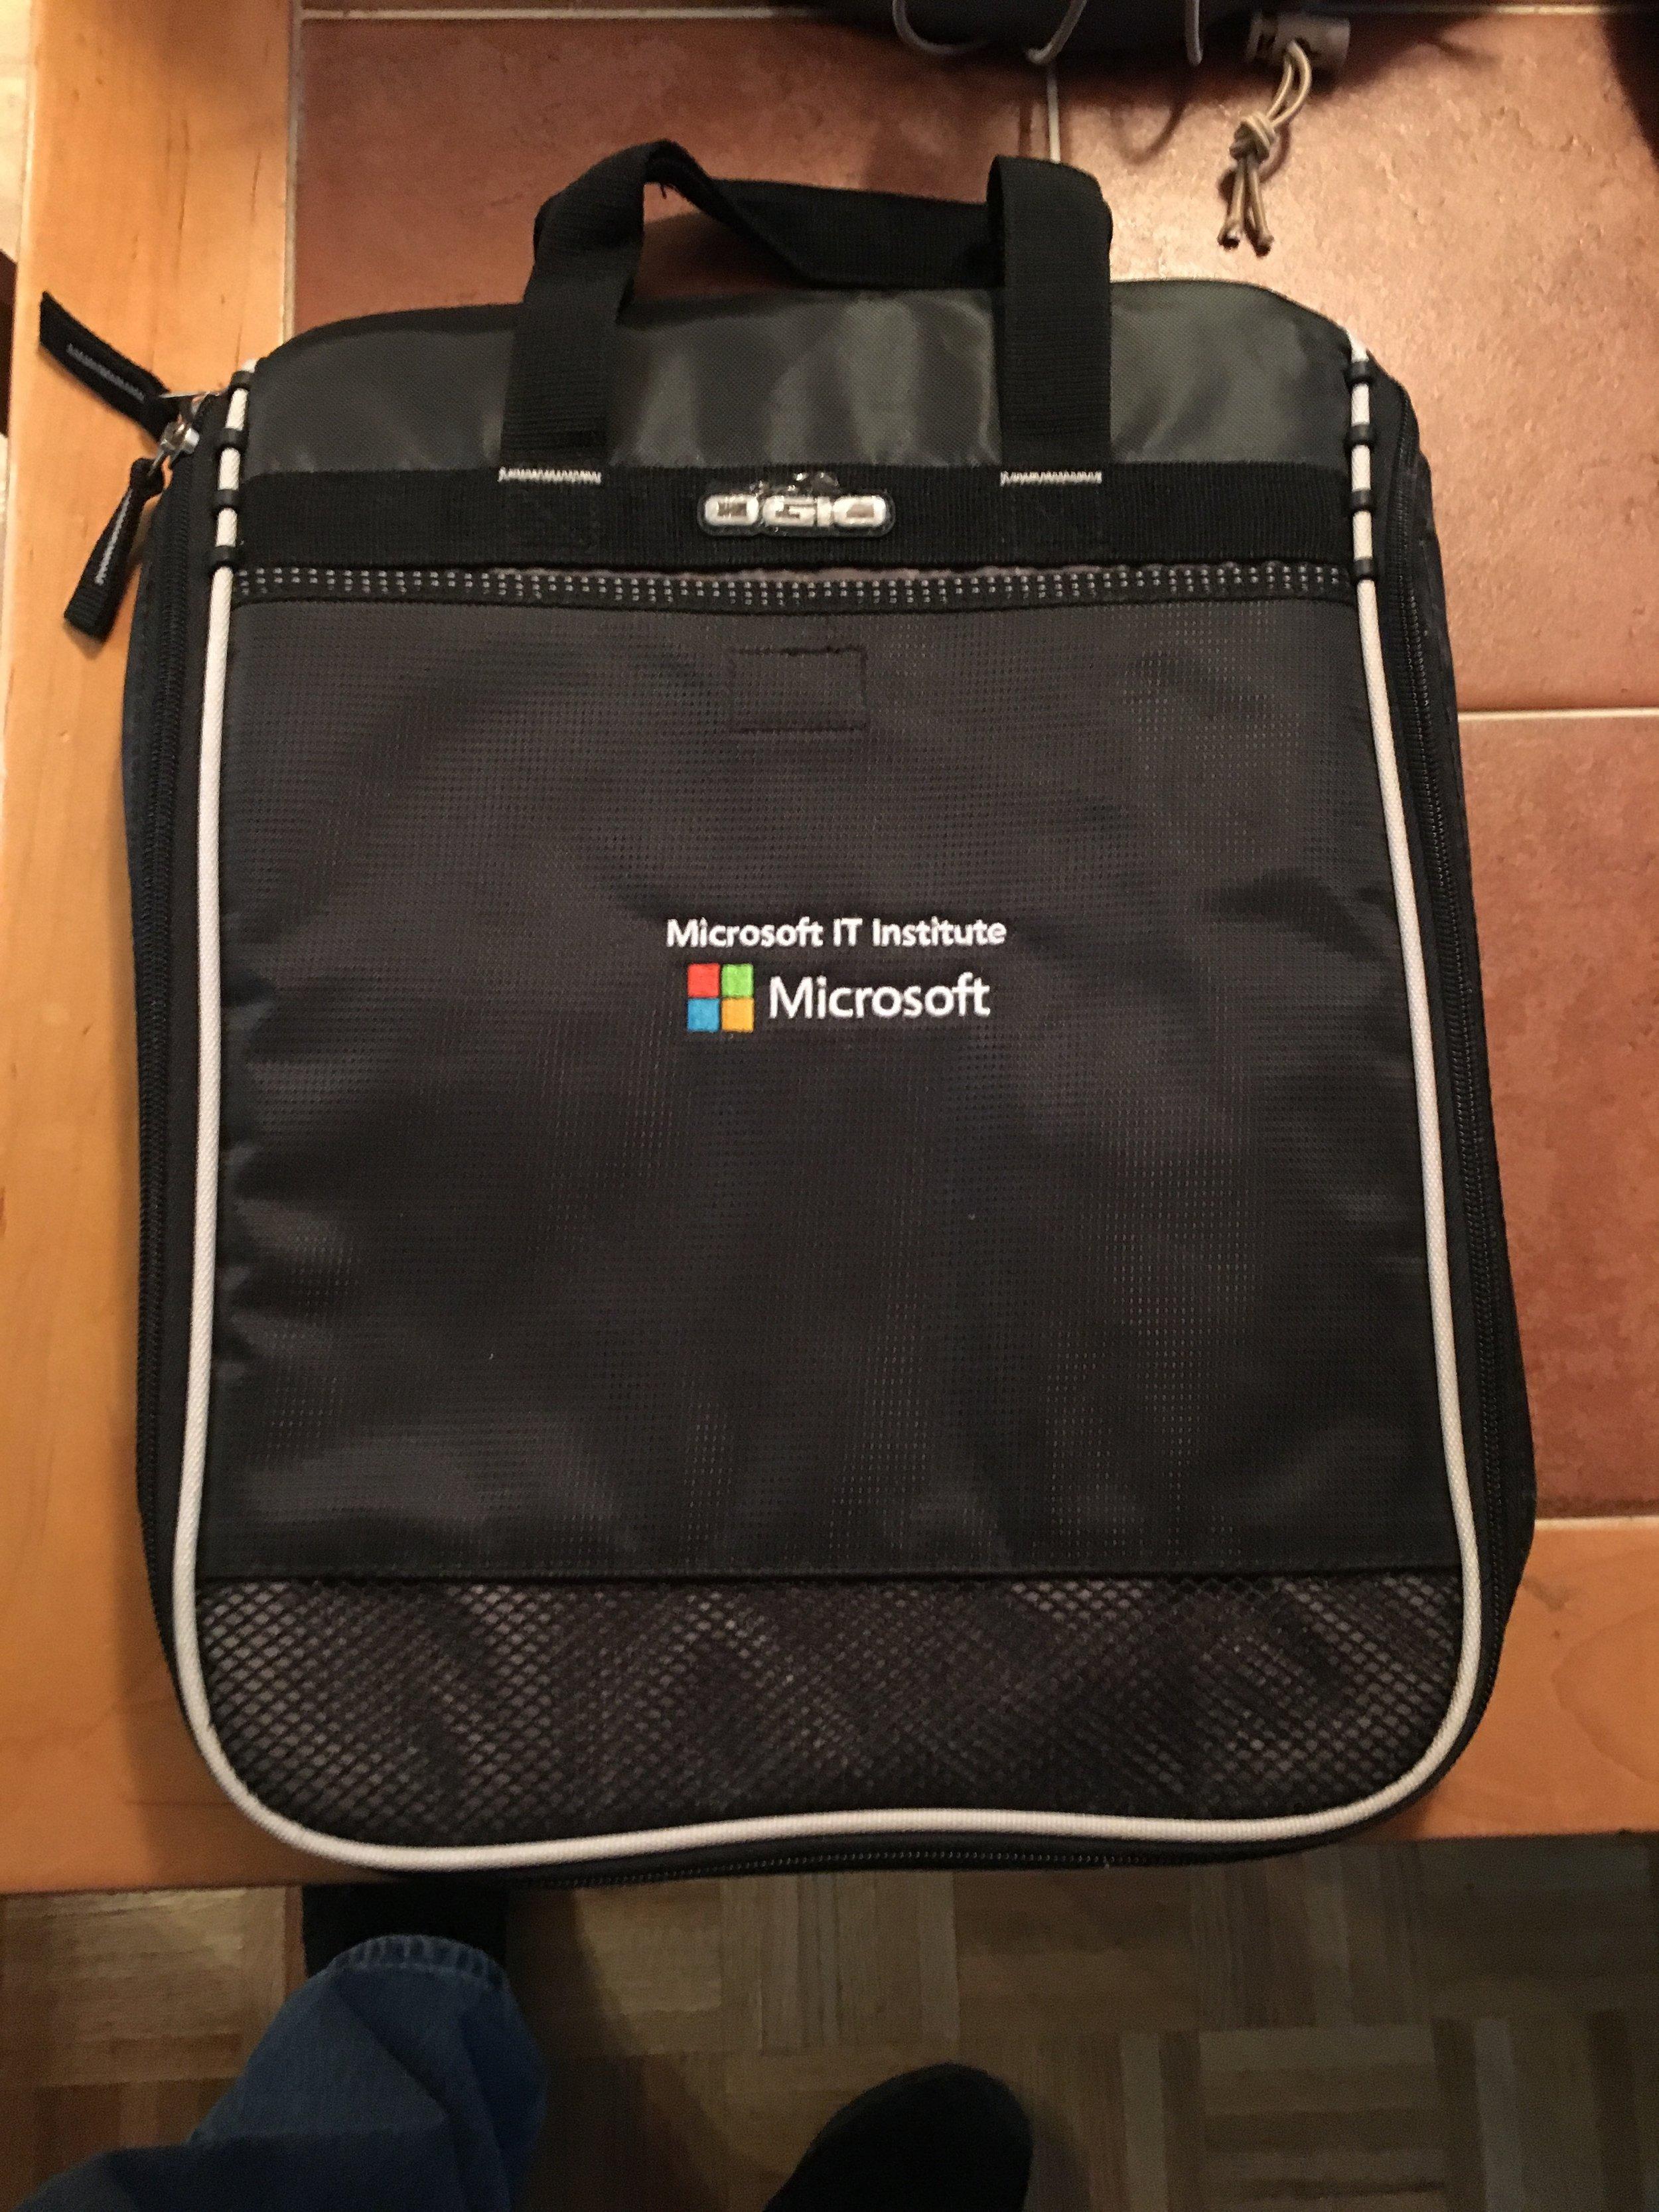 Microsoft IT Institute Surface Pro Bag x3